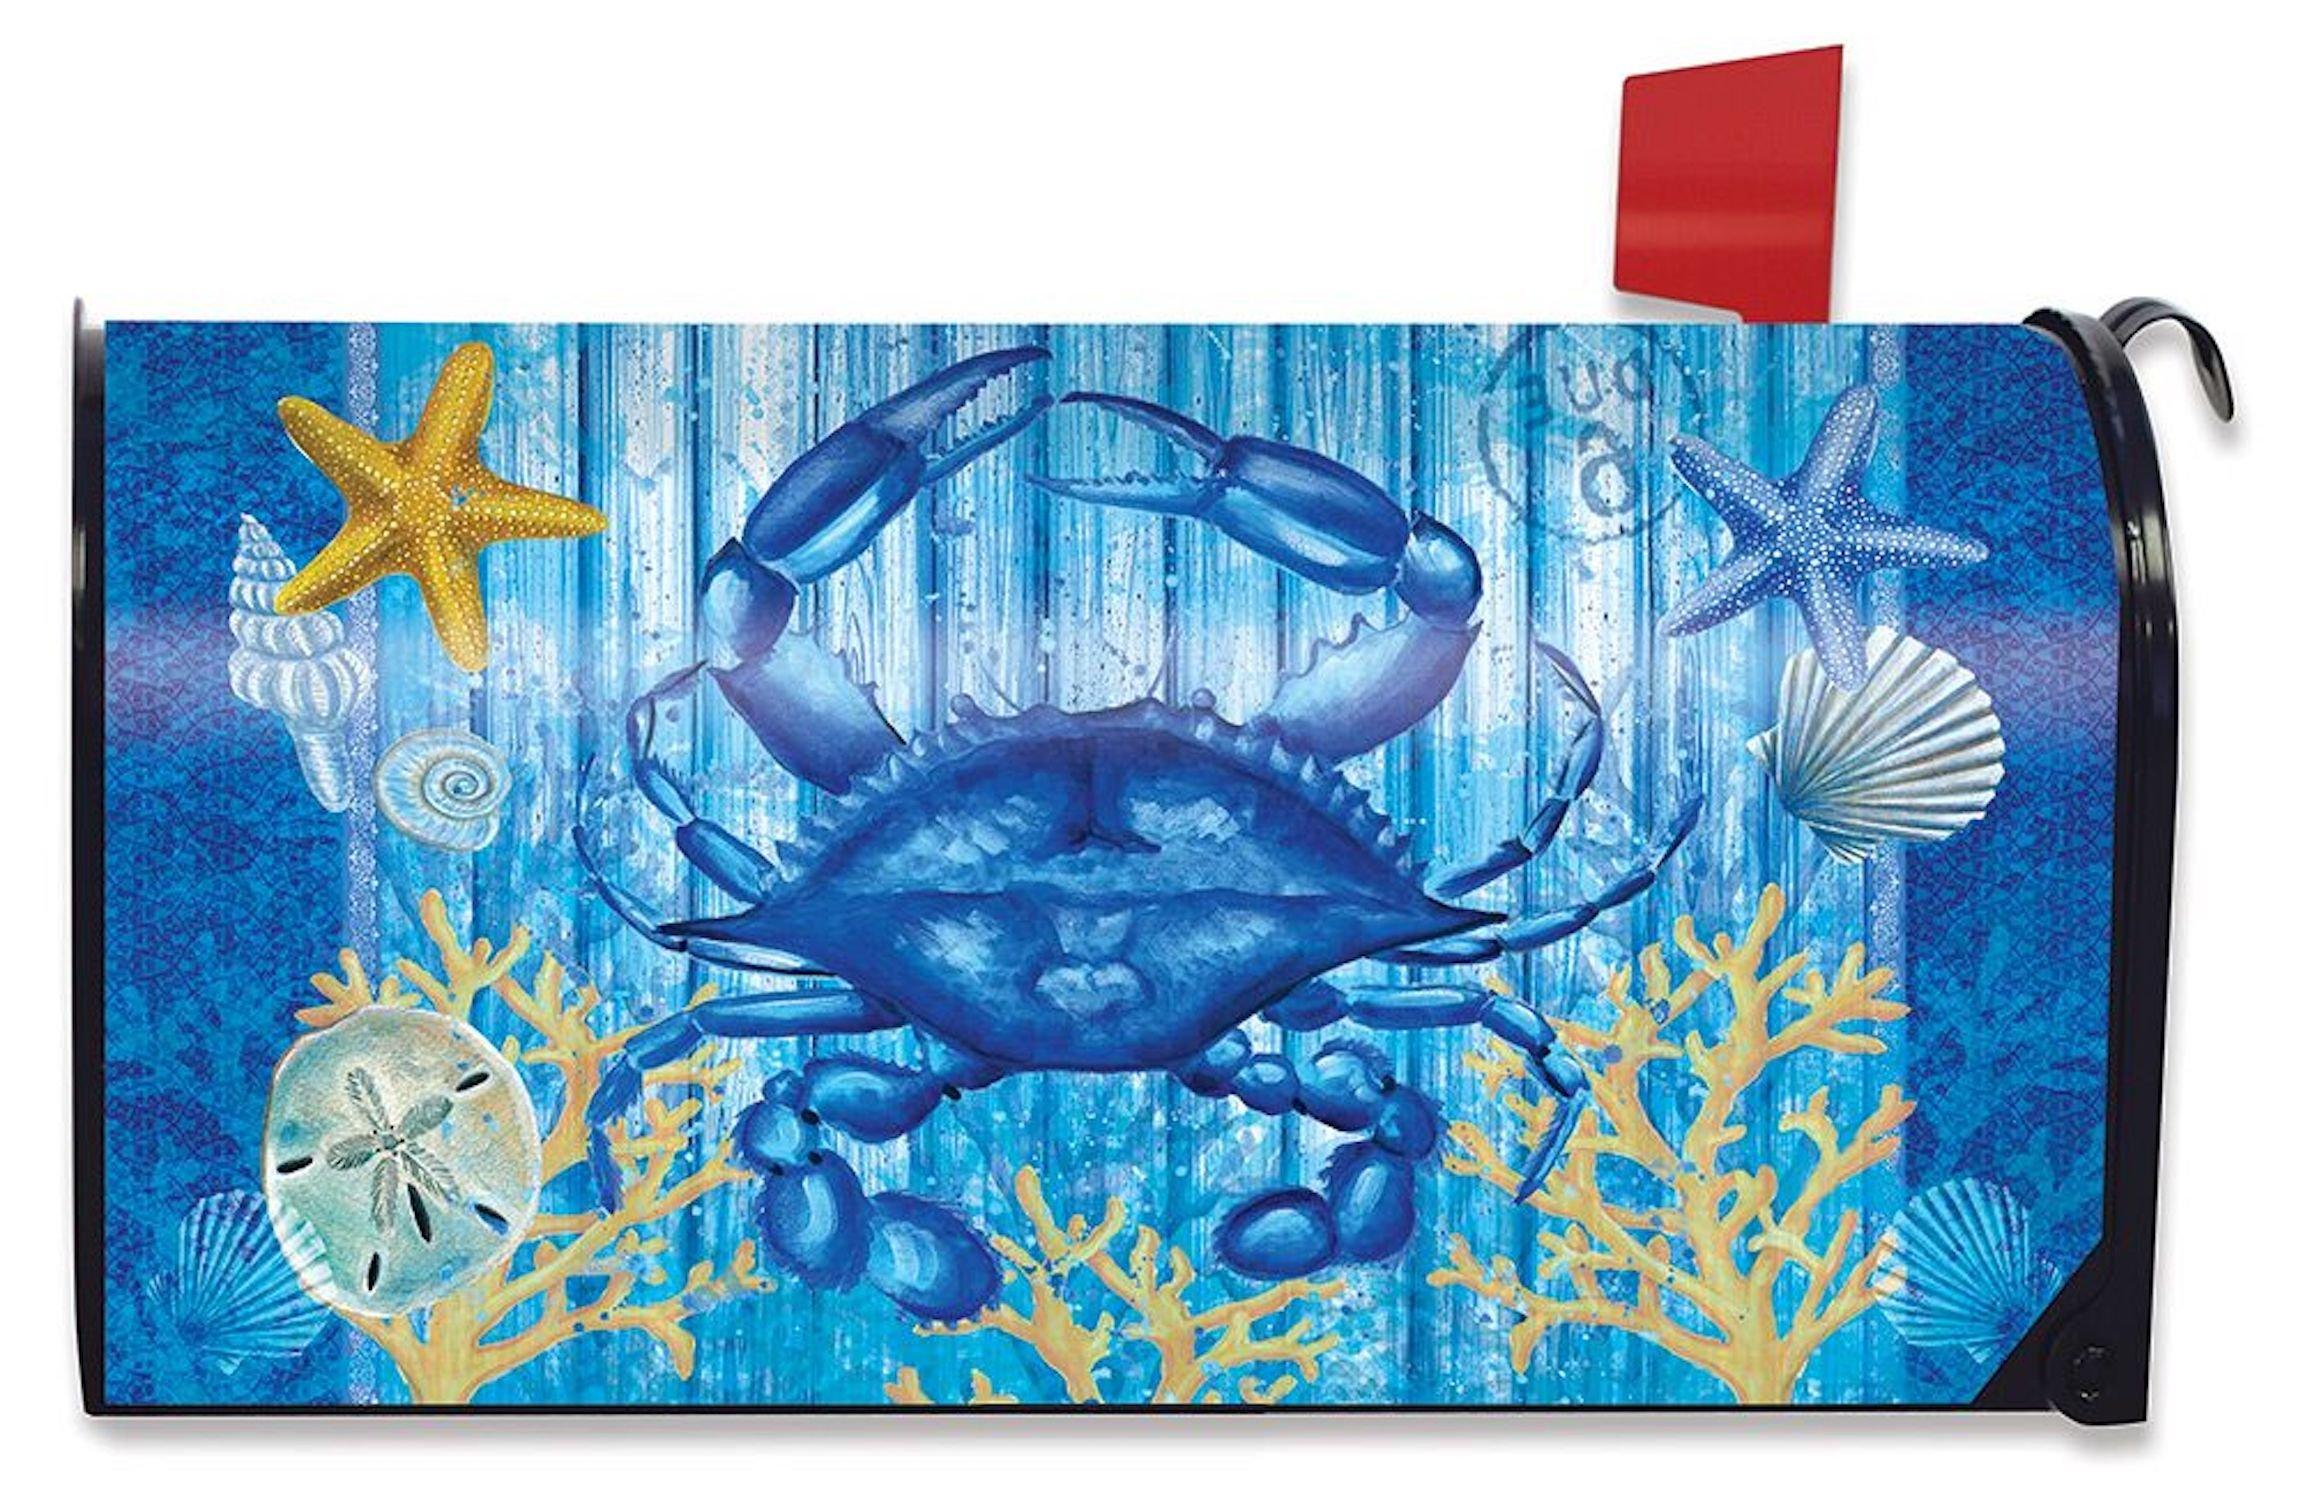 Briarwood Lane Blue Crab Welcome Summer Mailbox Cover Nautical Seashells Starfish Standard